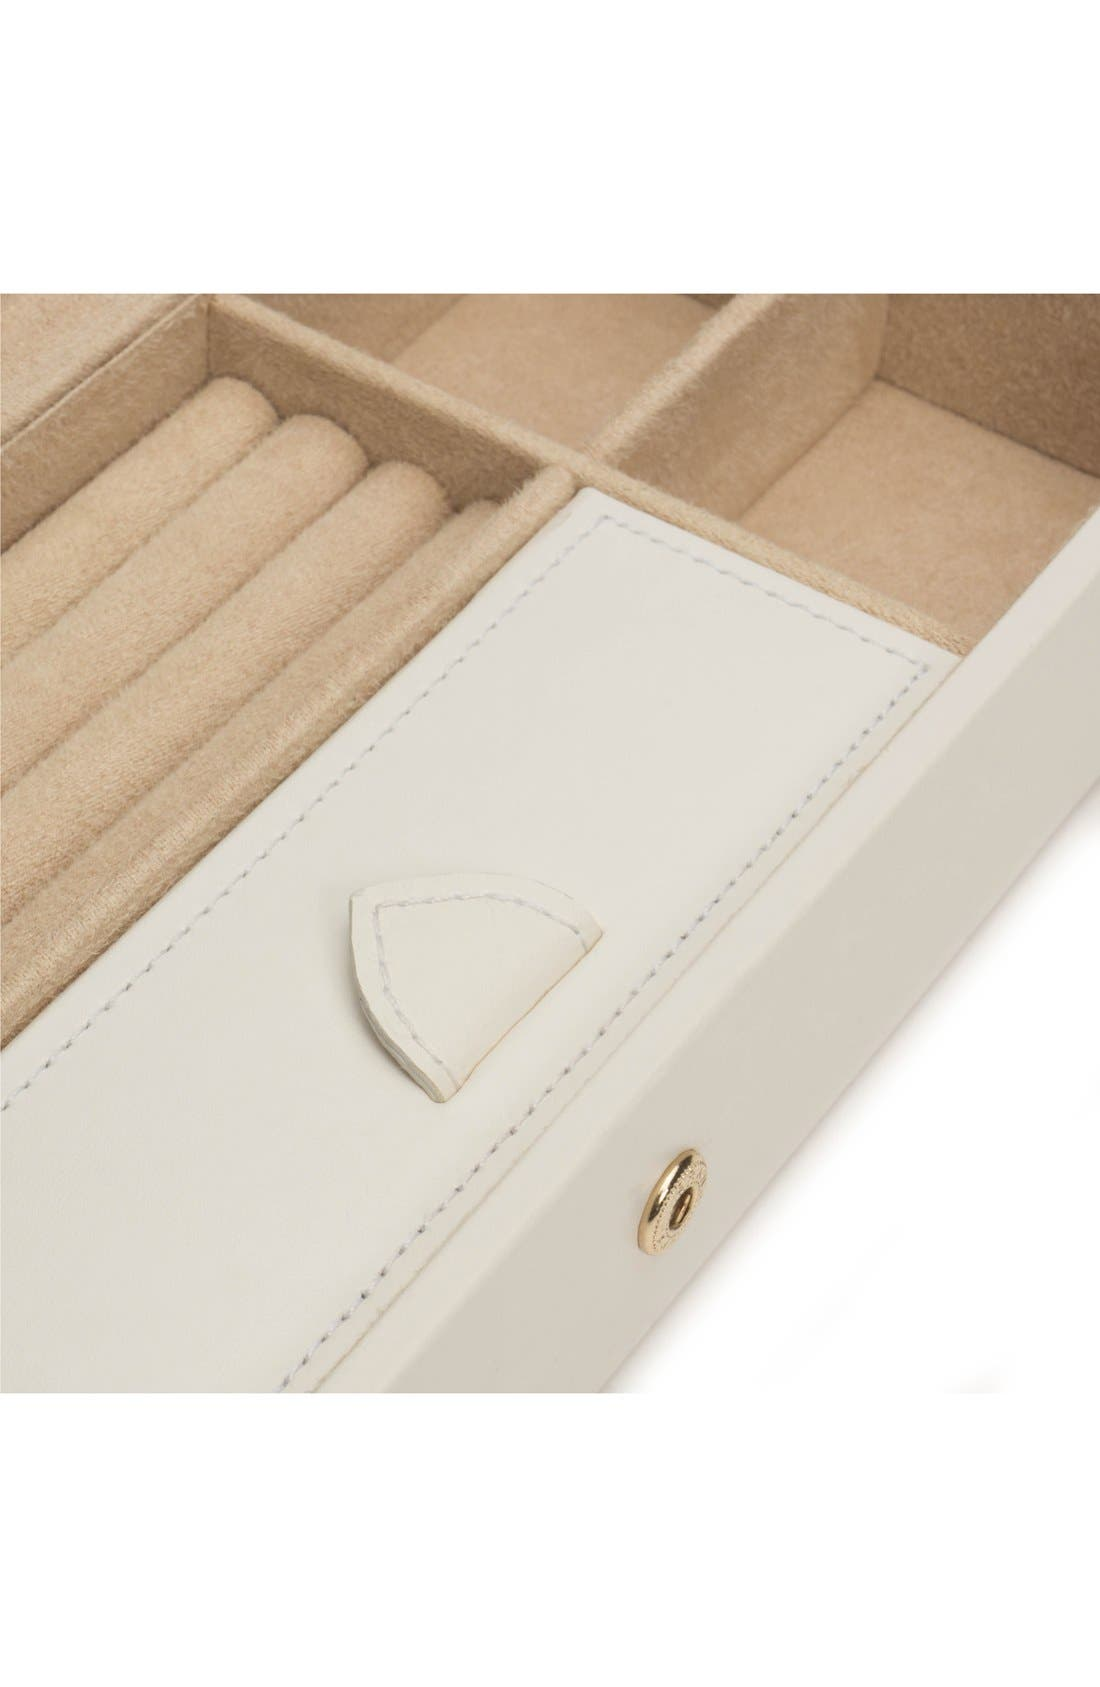 'Marrakesh' Jewelry Box,                             Alternate thumbnail 3, color,                             Cream